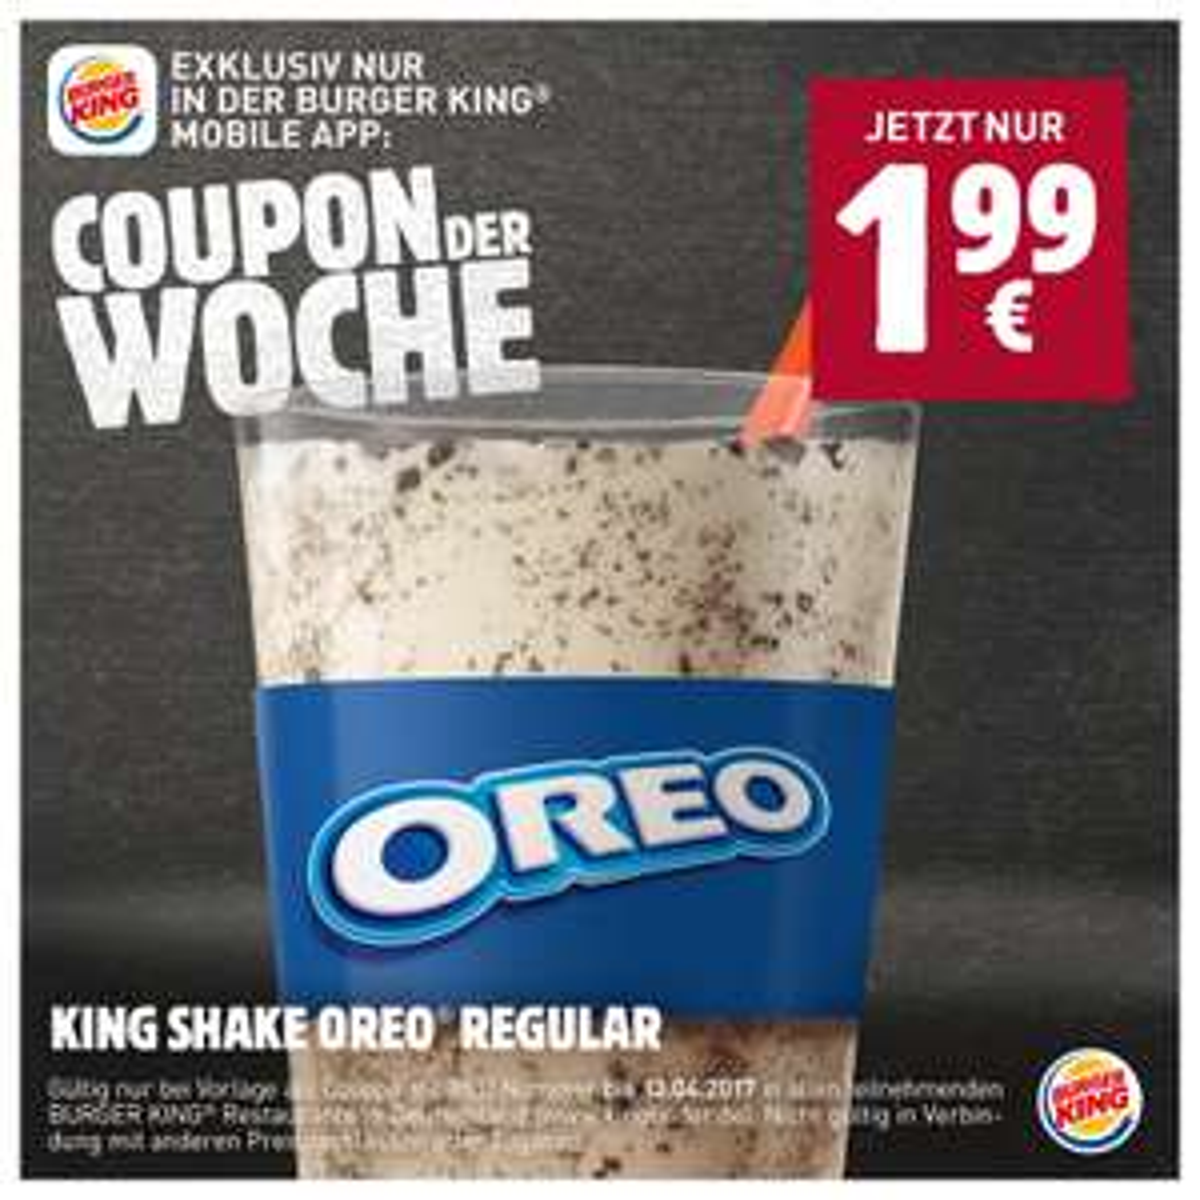 Burger King - Coupon der Woche: KING SHAKE OREO® für 1,99€